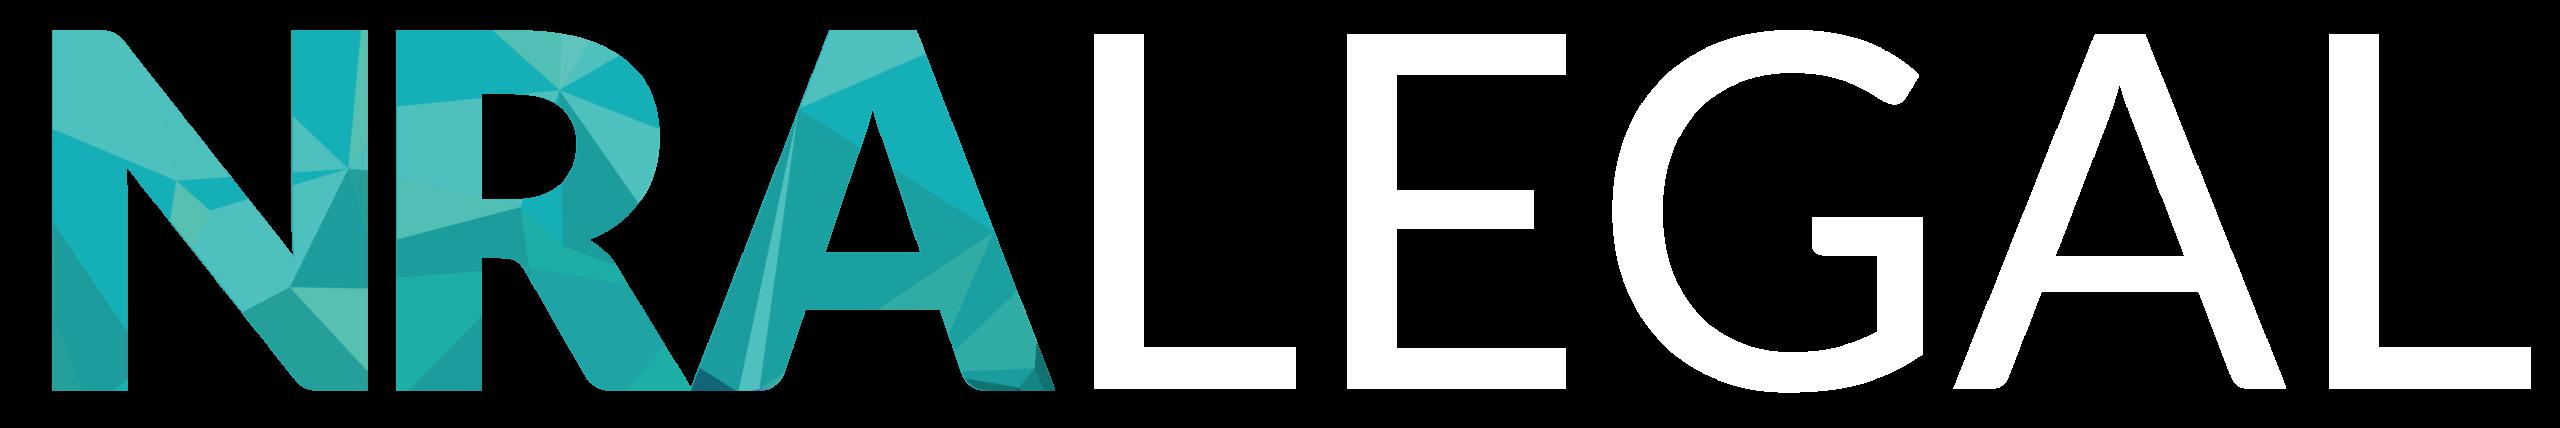 NRA Legal FINAL White-03